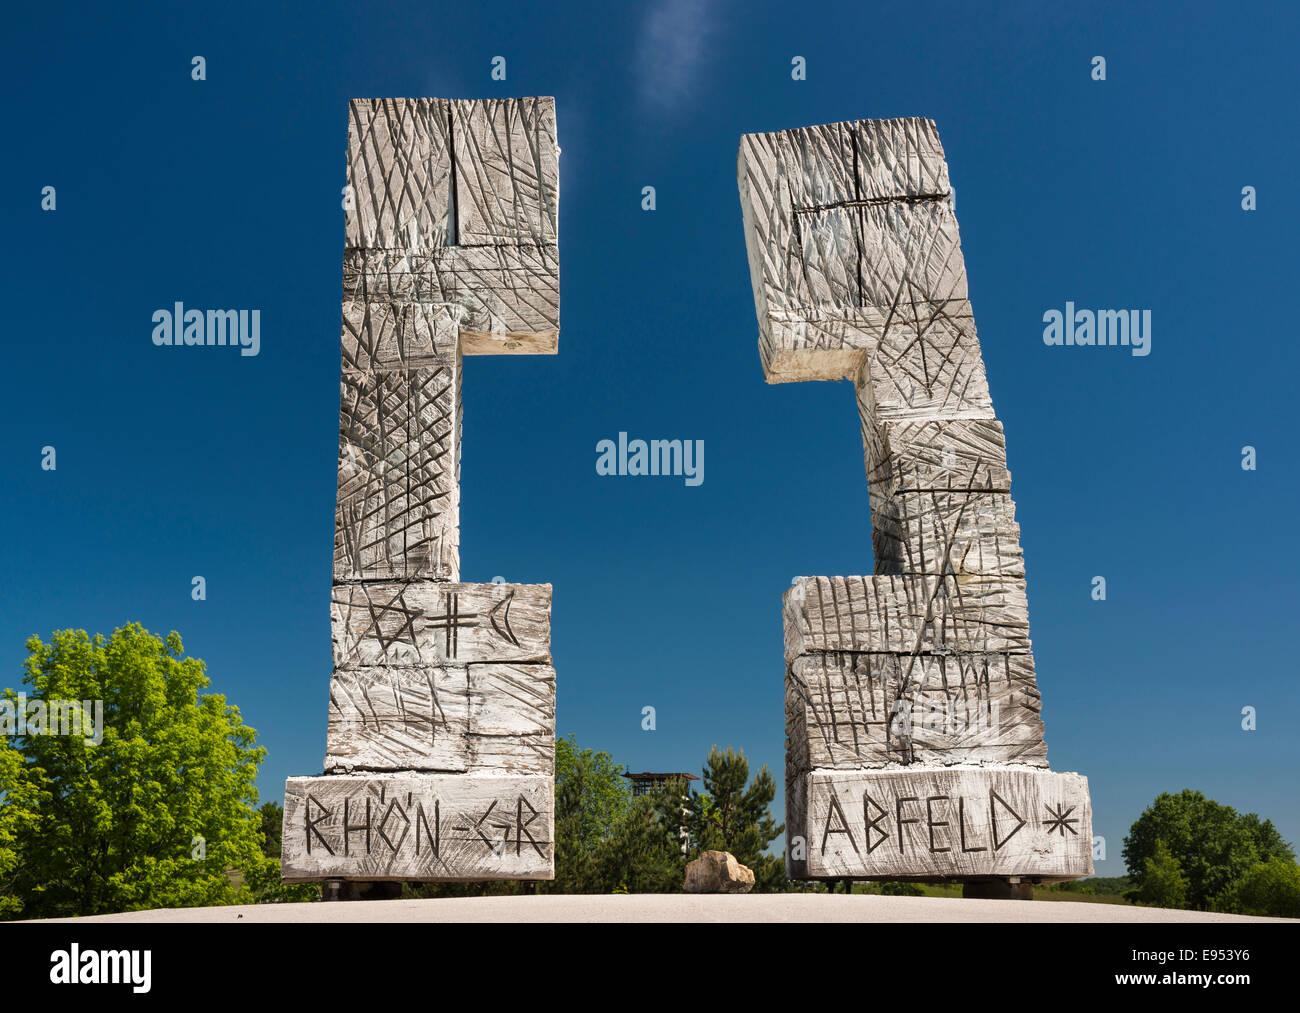 Installation 'Ouvrir Cross - une frontière surmonter', 2010, de l'artiste Gernot Ehrsam, Skulpturenpark Photo Stock